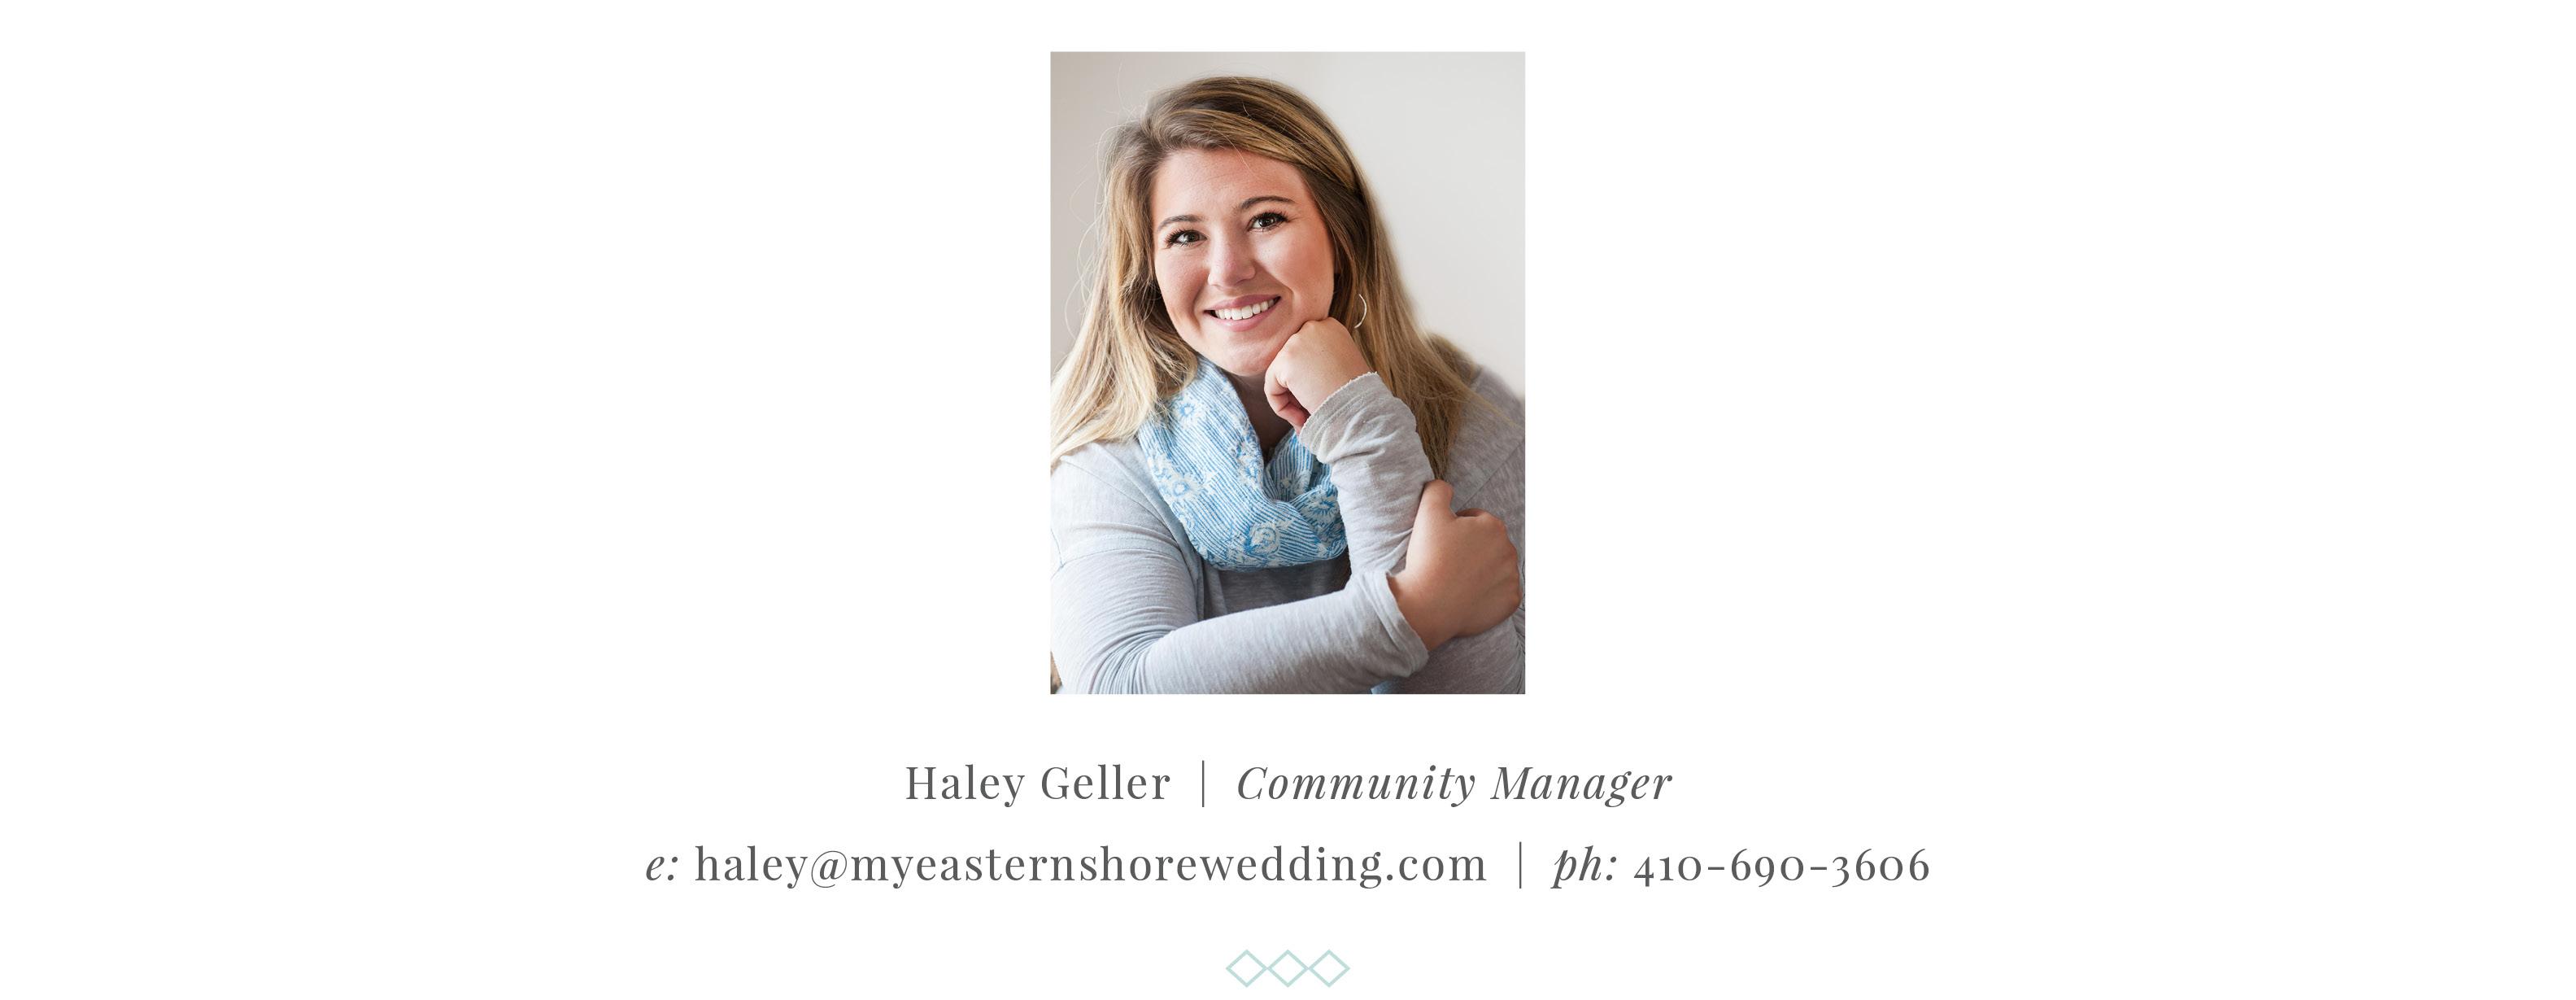 Haley Geller